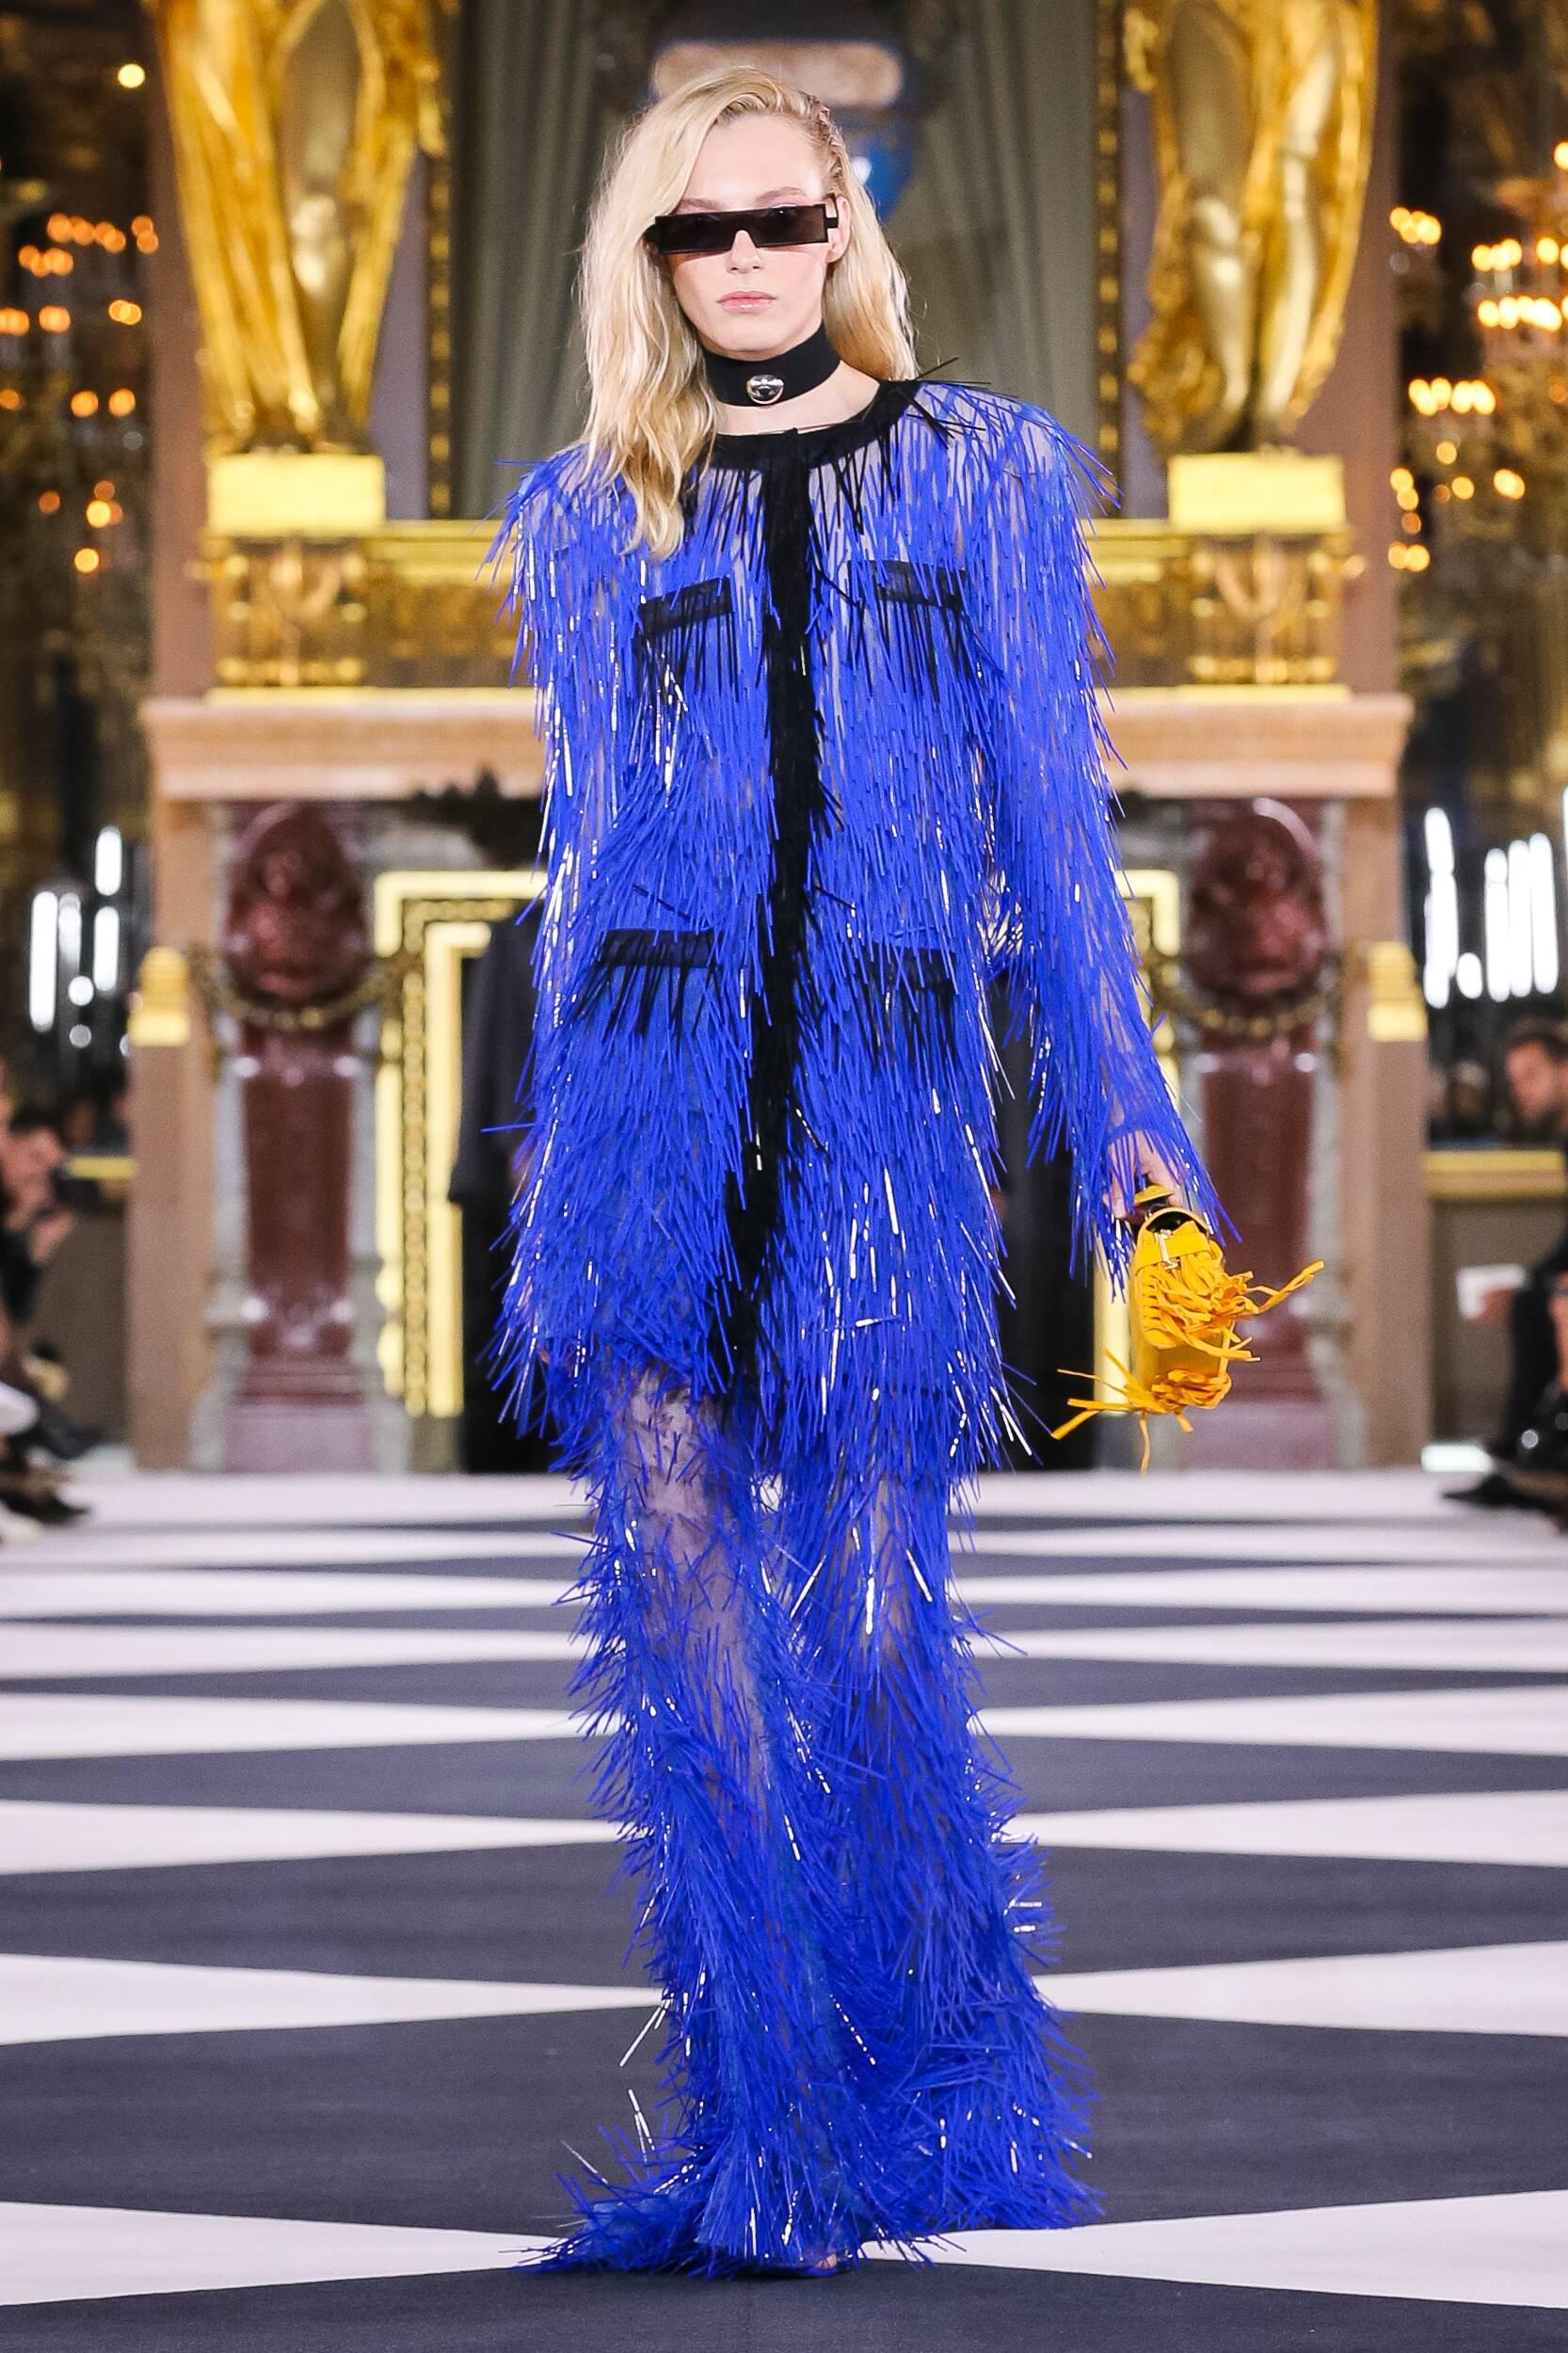 Woman SS 2020 Balmain Show Paris Fashion Week